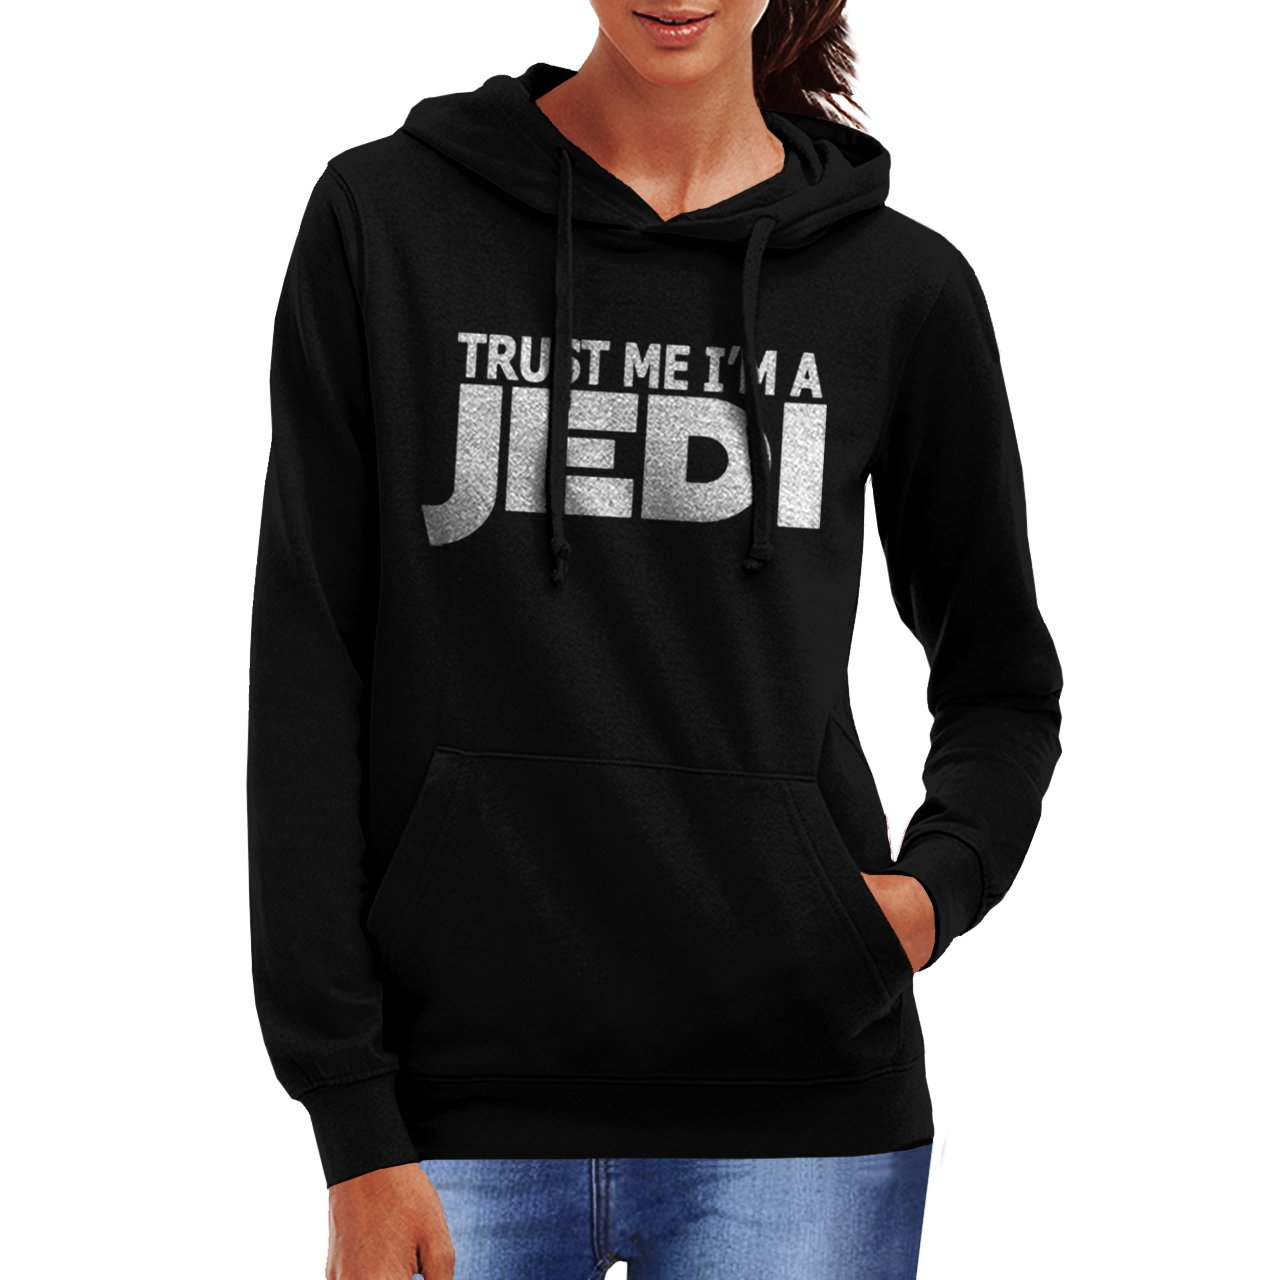 Trust Me I'm Jedi Star Wars Women Hoodie New Unique S-2XL